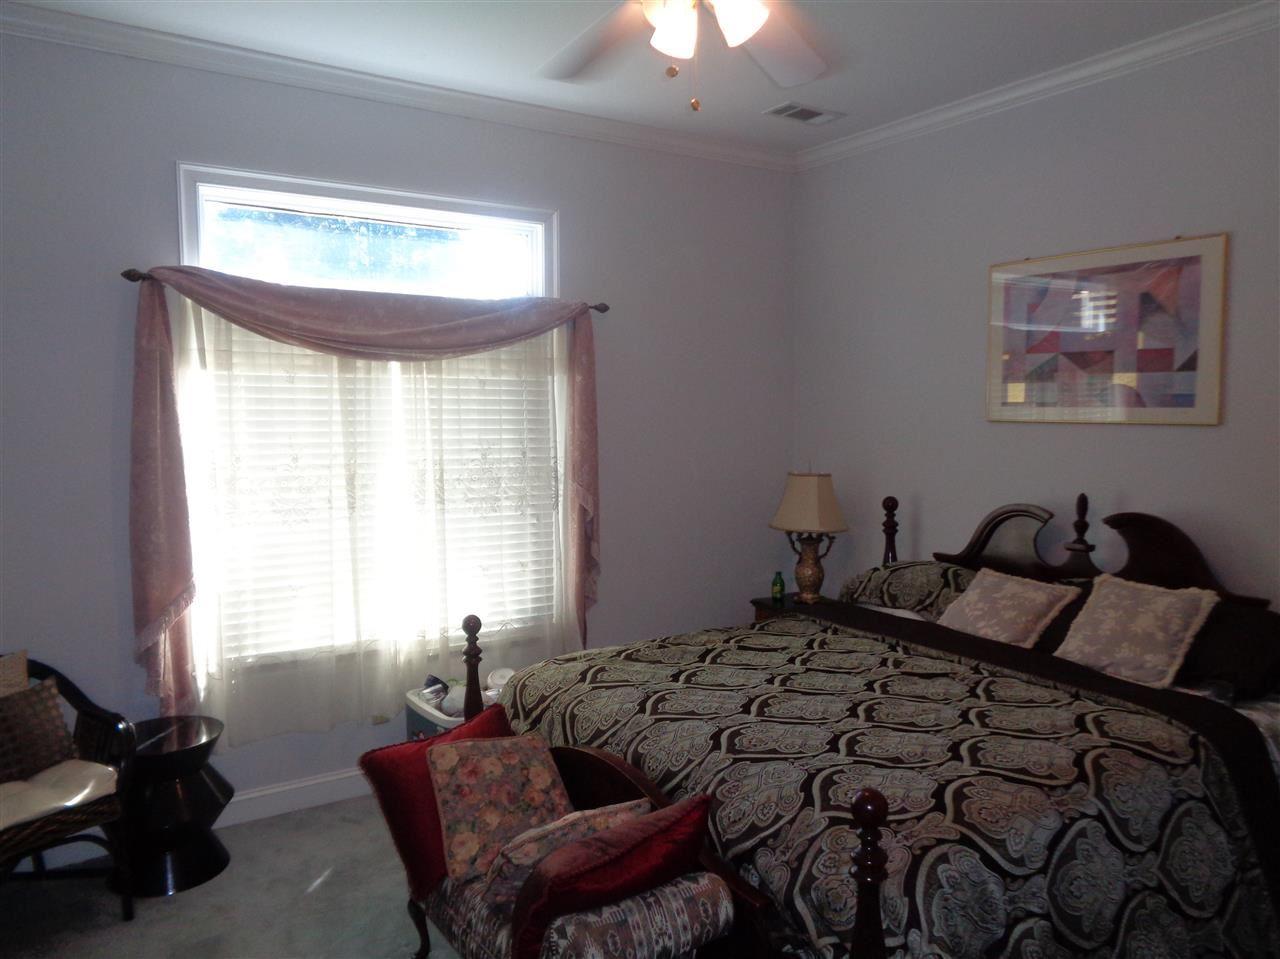 5017 Le Chateau Memphis, TN 38125 - MLS #: 10001346